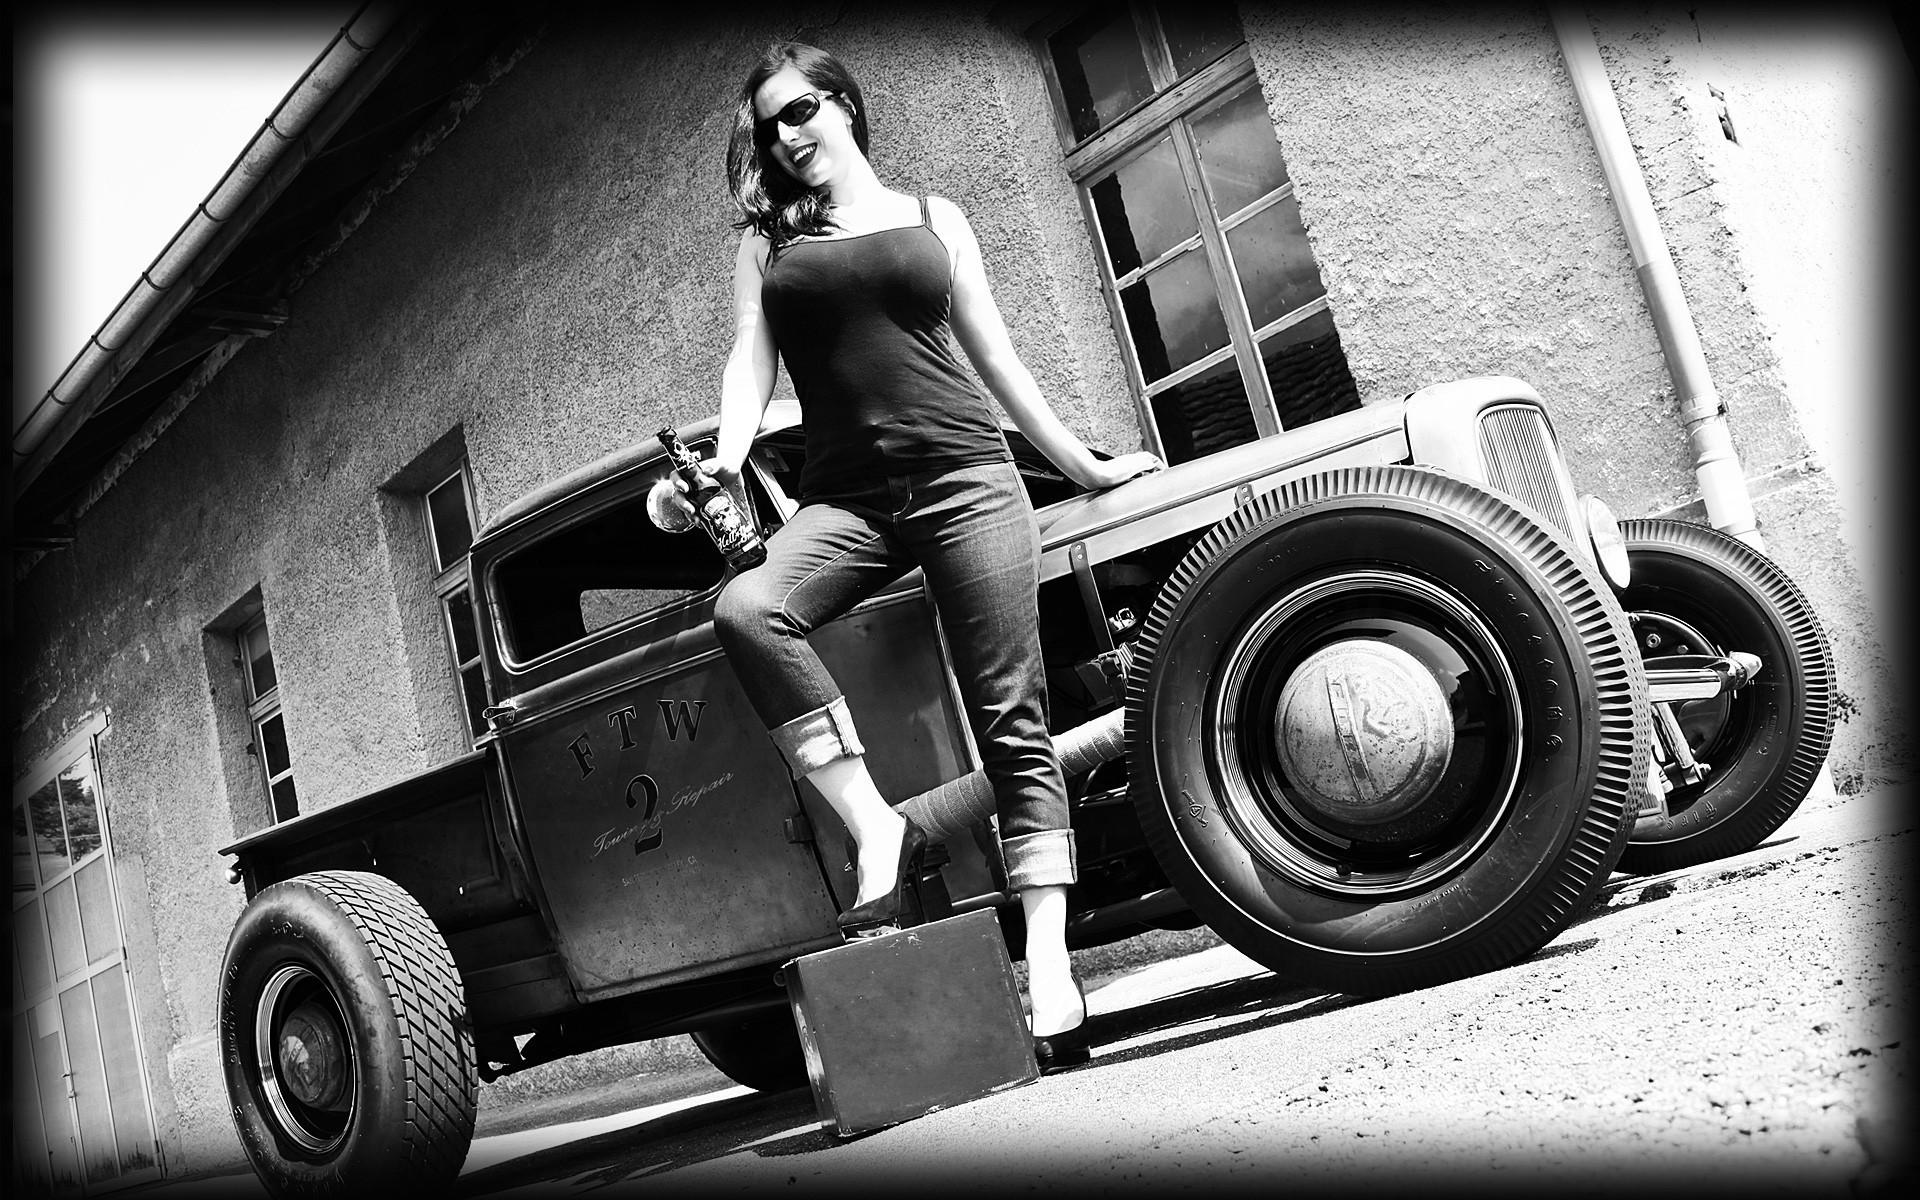 vehicles cars auto hot rod rat classic retro old wheels black white  architecture buildings brick women